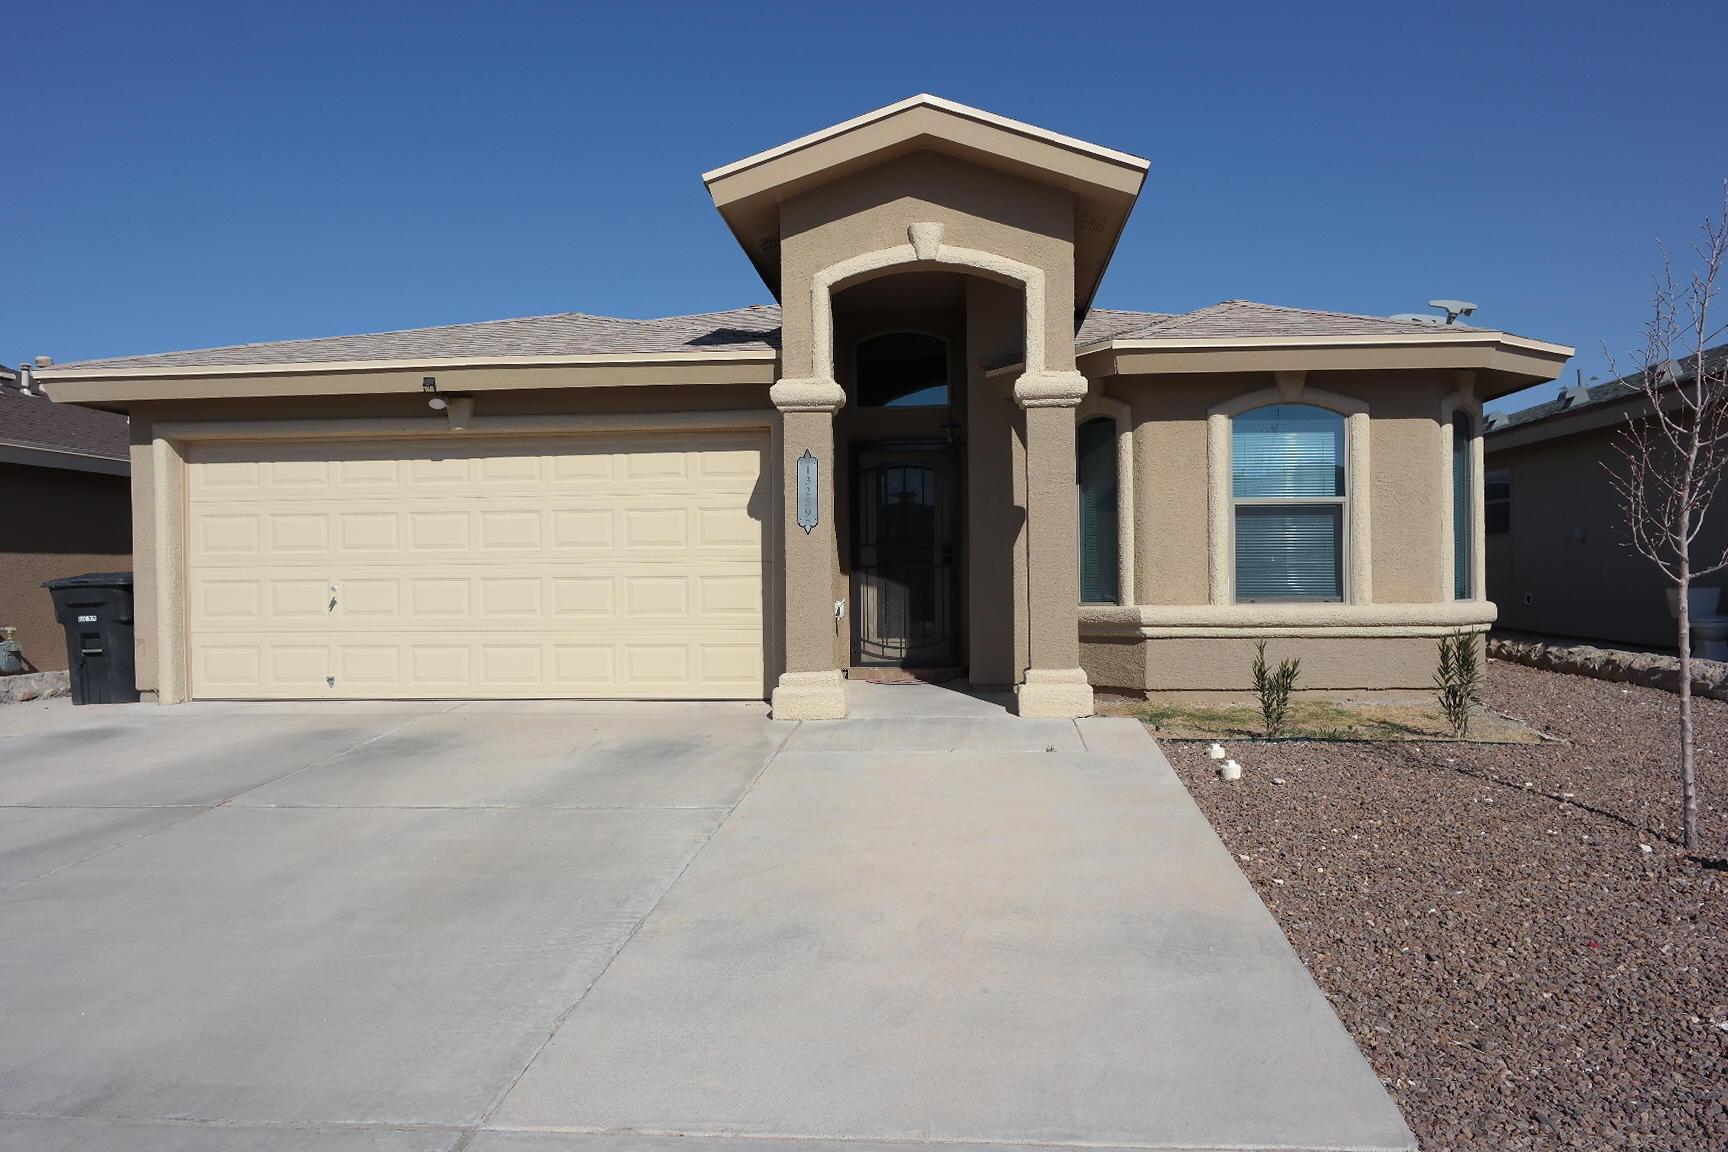 13259 KESTREL, Horizon City, Texas 79928, 4 Bedrooms Bedrooms, ,3 BathroomsBathrooms,Residential,For sale,KESTREL,822047